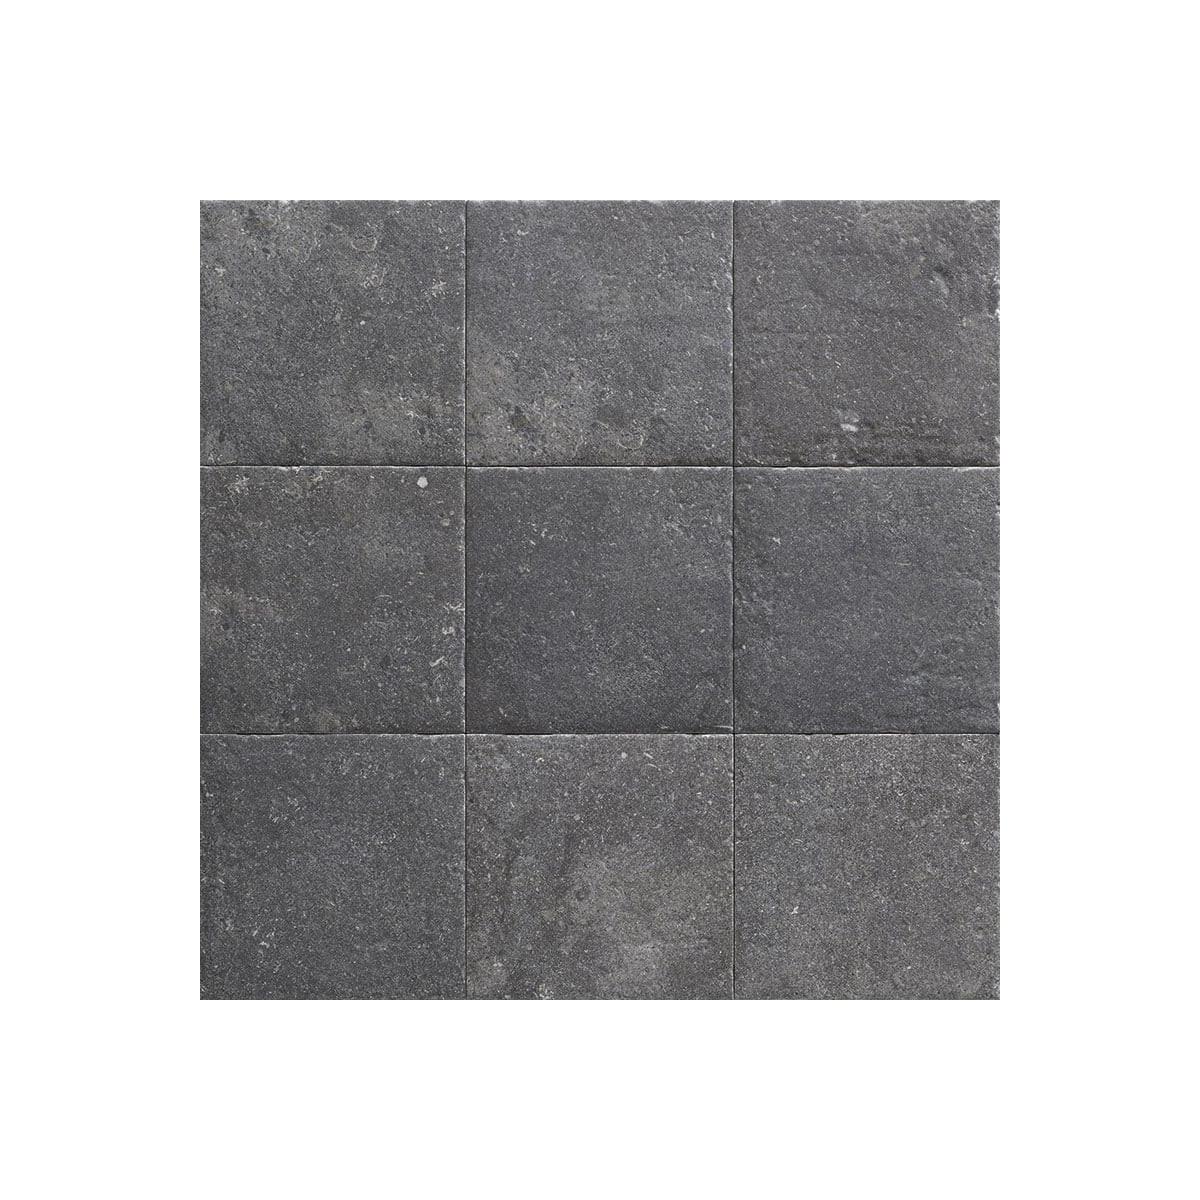 Bali Lava Stone 20x20 (caja 1 m2) - Serie Bali Stones - Marca Mainzu